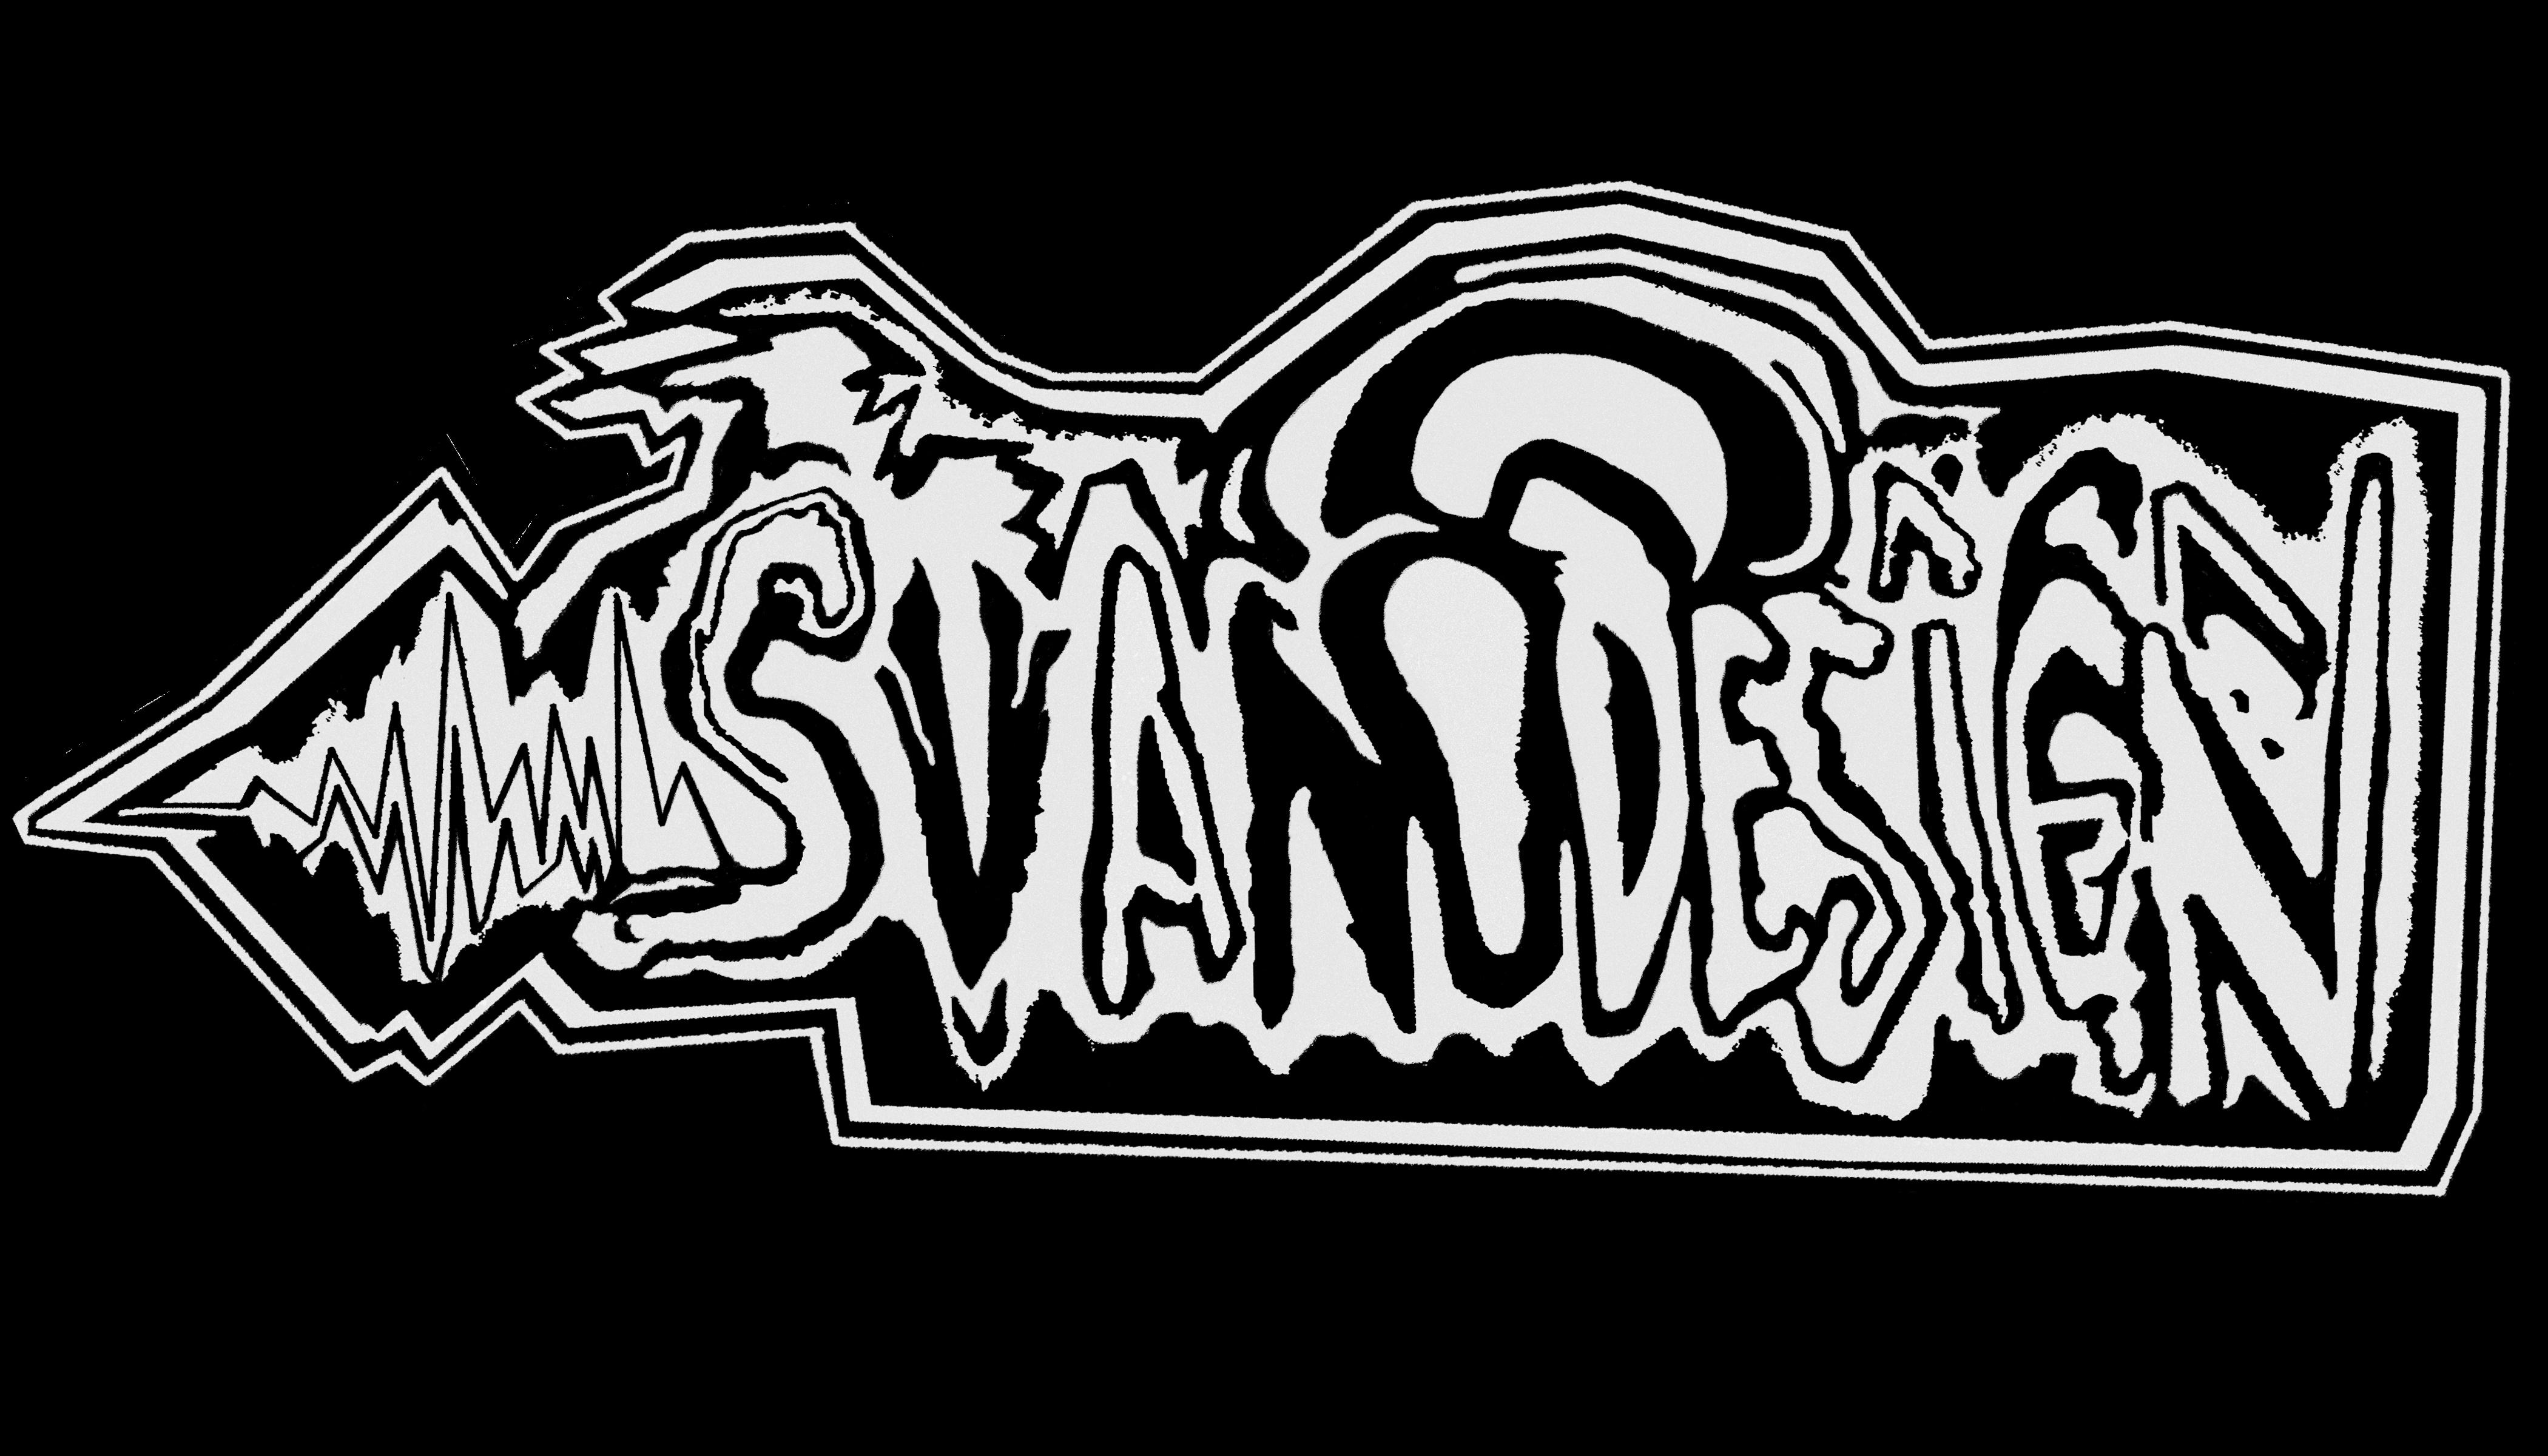 svanodesign Cover